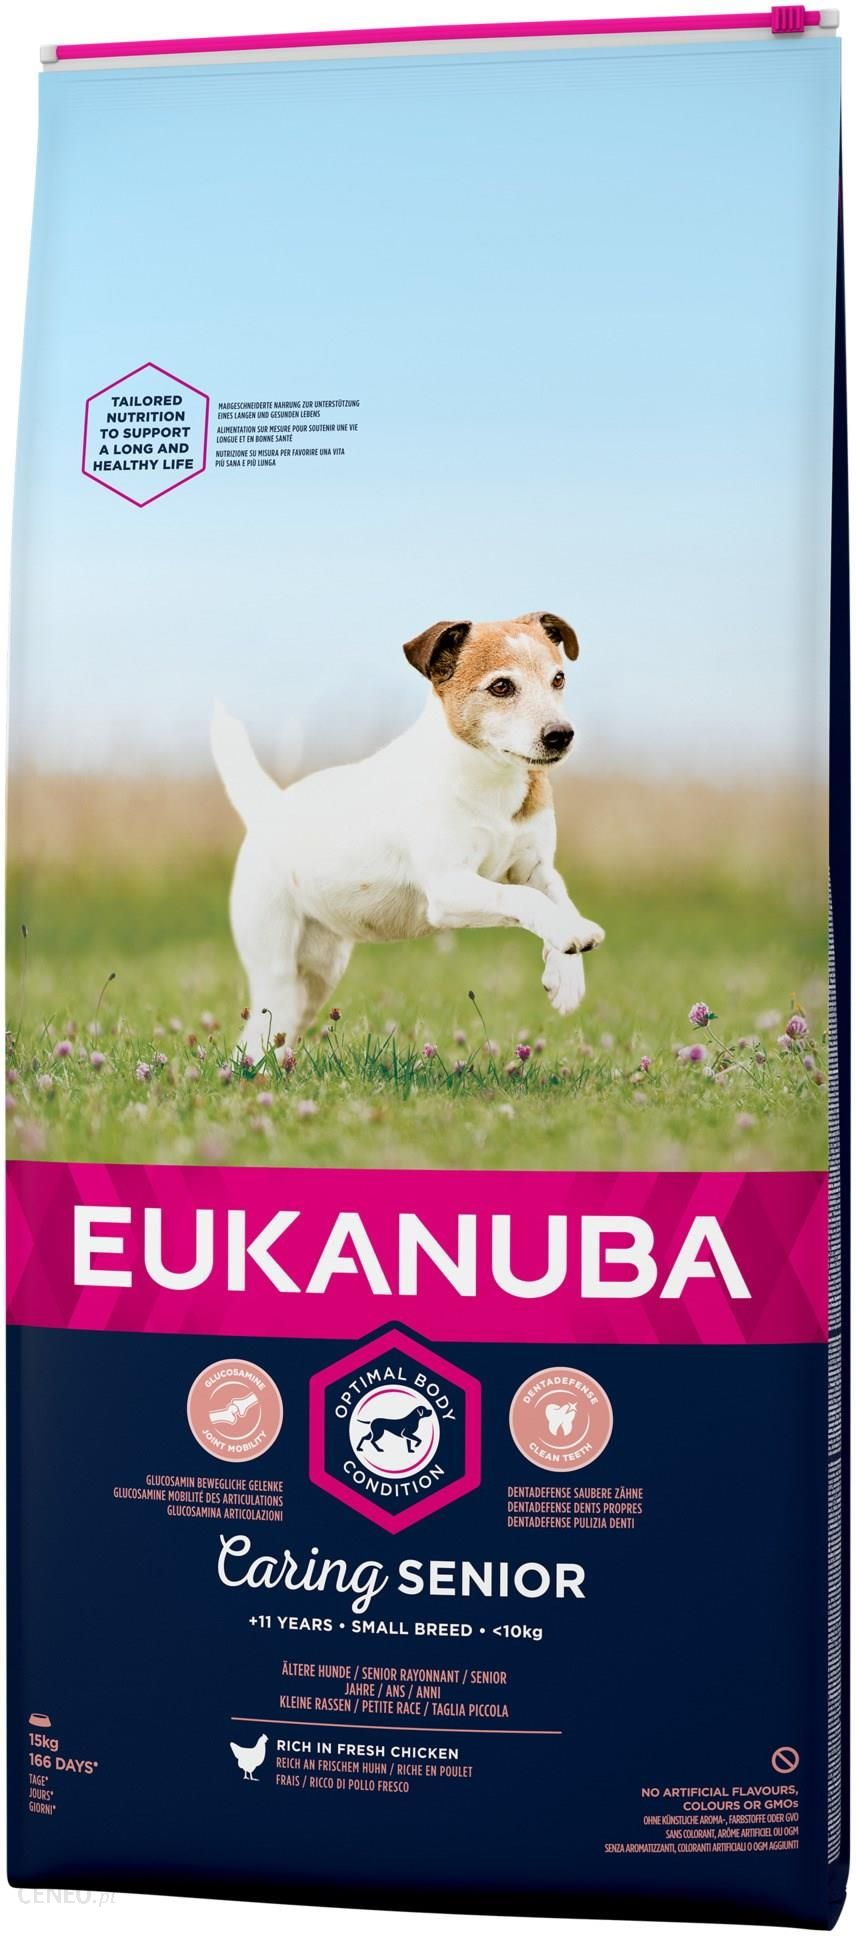 EUKANUBA Caring Senior Small Breed bogata w świeżego kurczaka 15kg